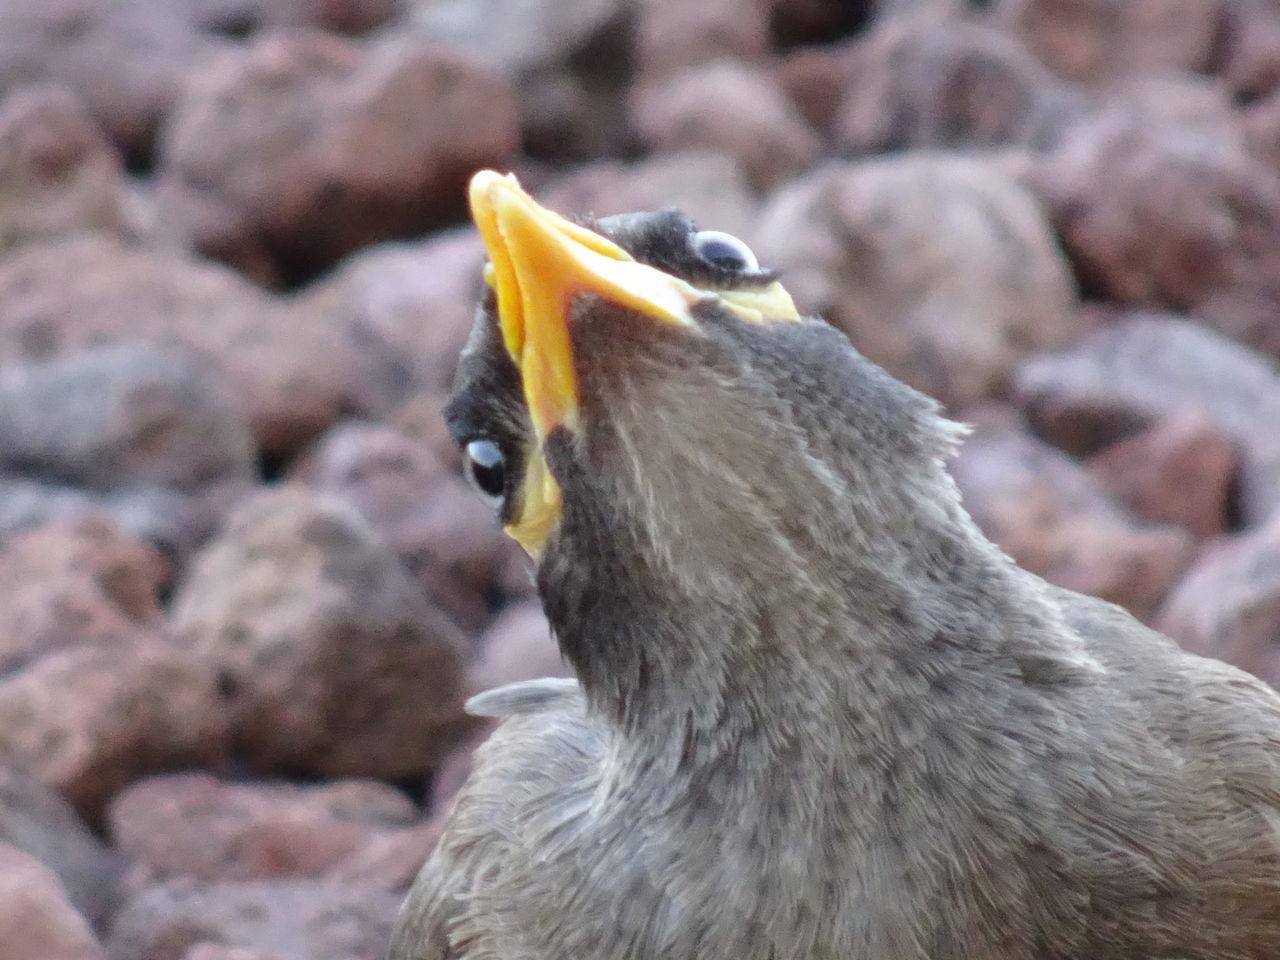 animals in the wild, bird, animal themes, animal wildlife, beak, one animal, young bird, no people, day, nature, close-up, outdoors